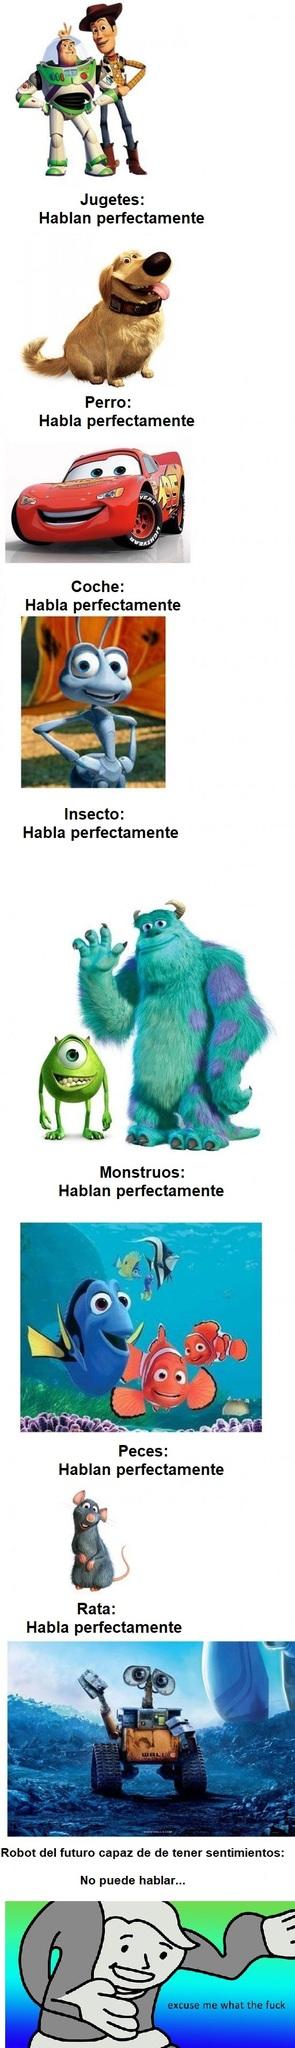 Pixar fuck the logics - meme